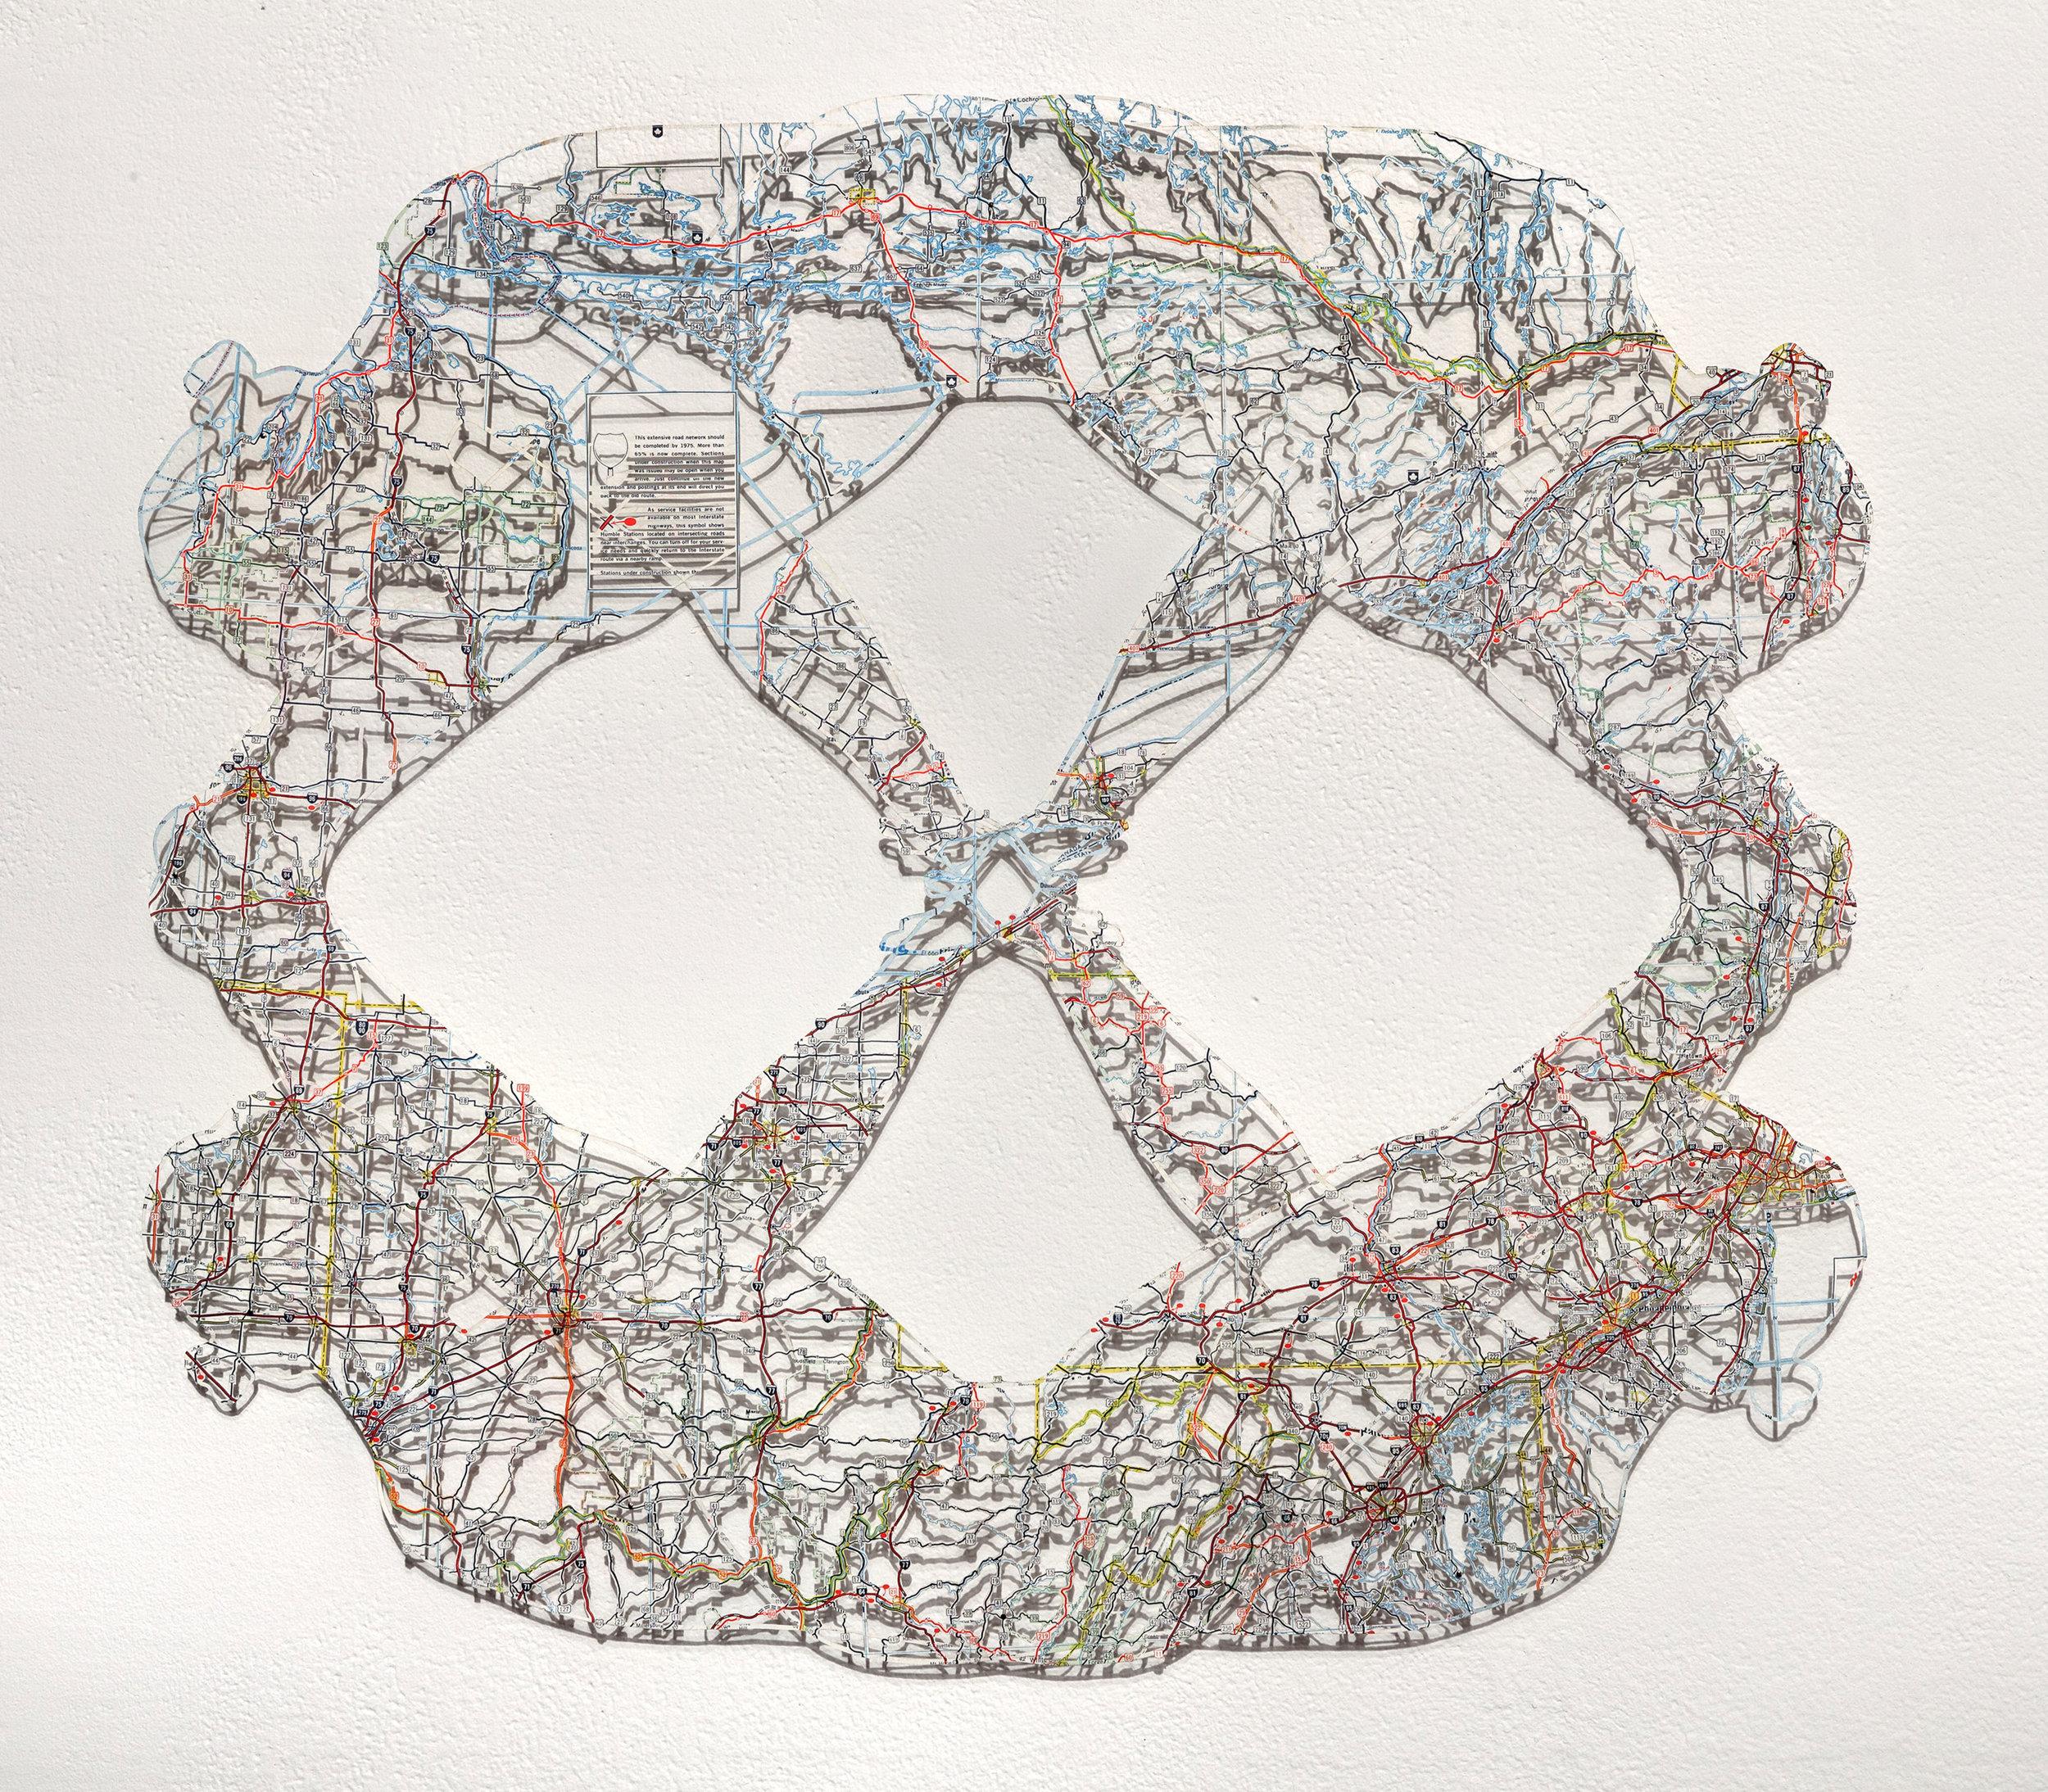 Untitled (Object II), 19x21 in, hand-cut road map, 2017